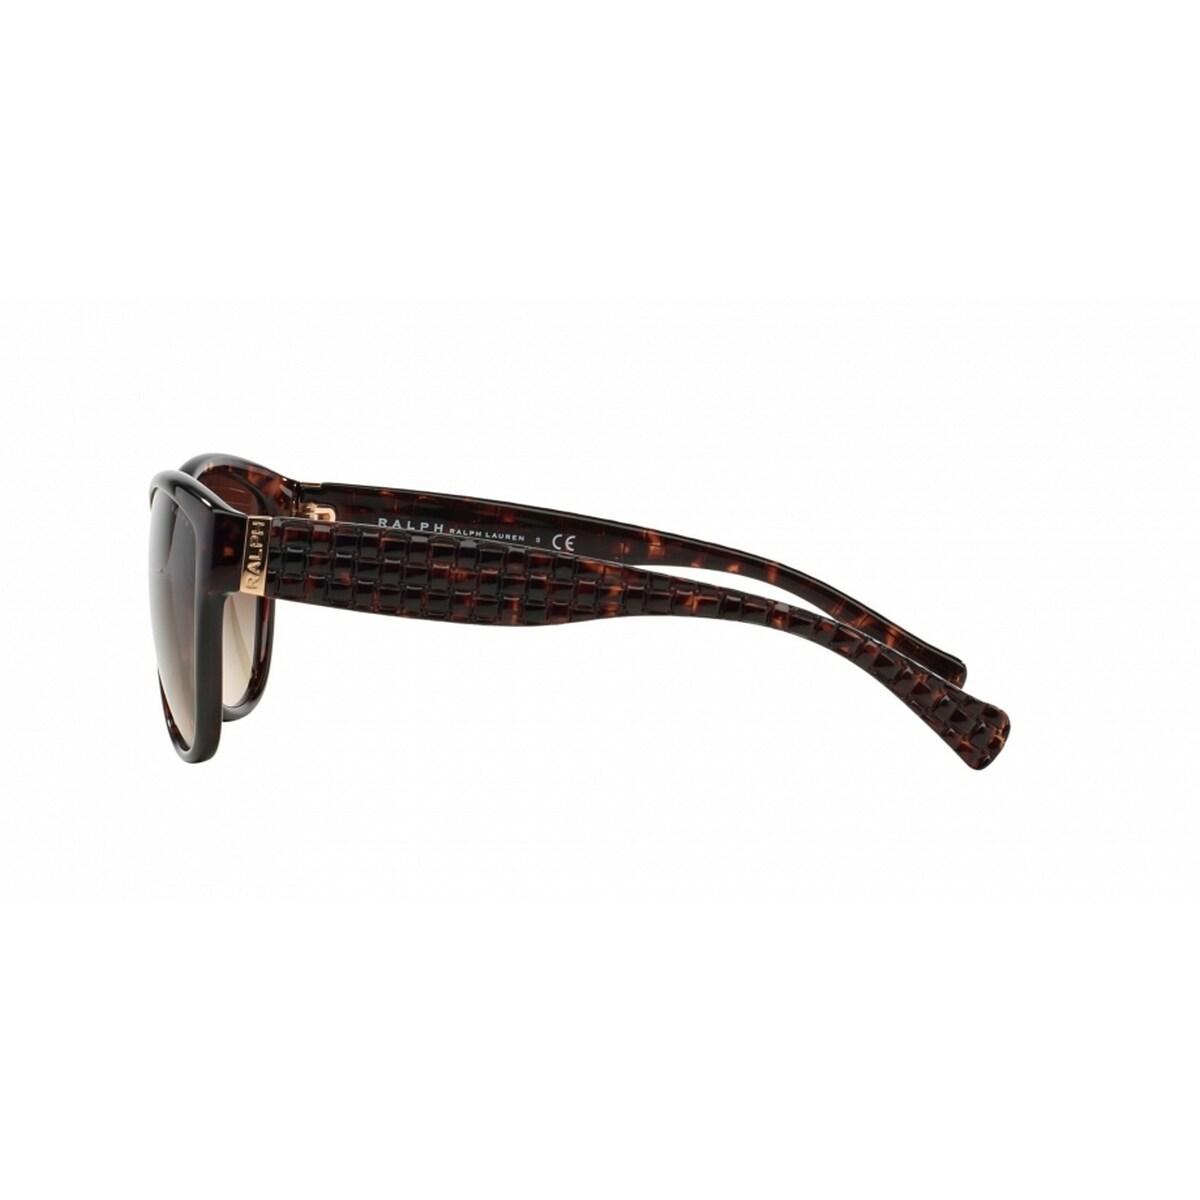 726dd4c8a534 Shop Ralph by Ralph Lauren Women's RA5176 50213 58 Cateye Plastic Havana  Brown Sunglasses - Free Shipping Today - Overstock - 14692898